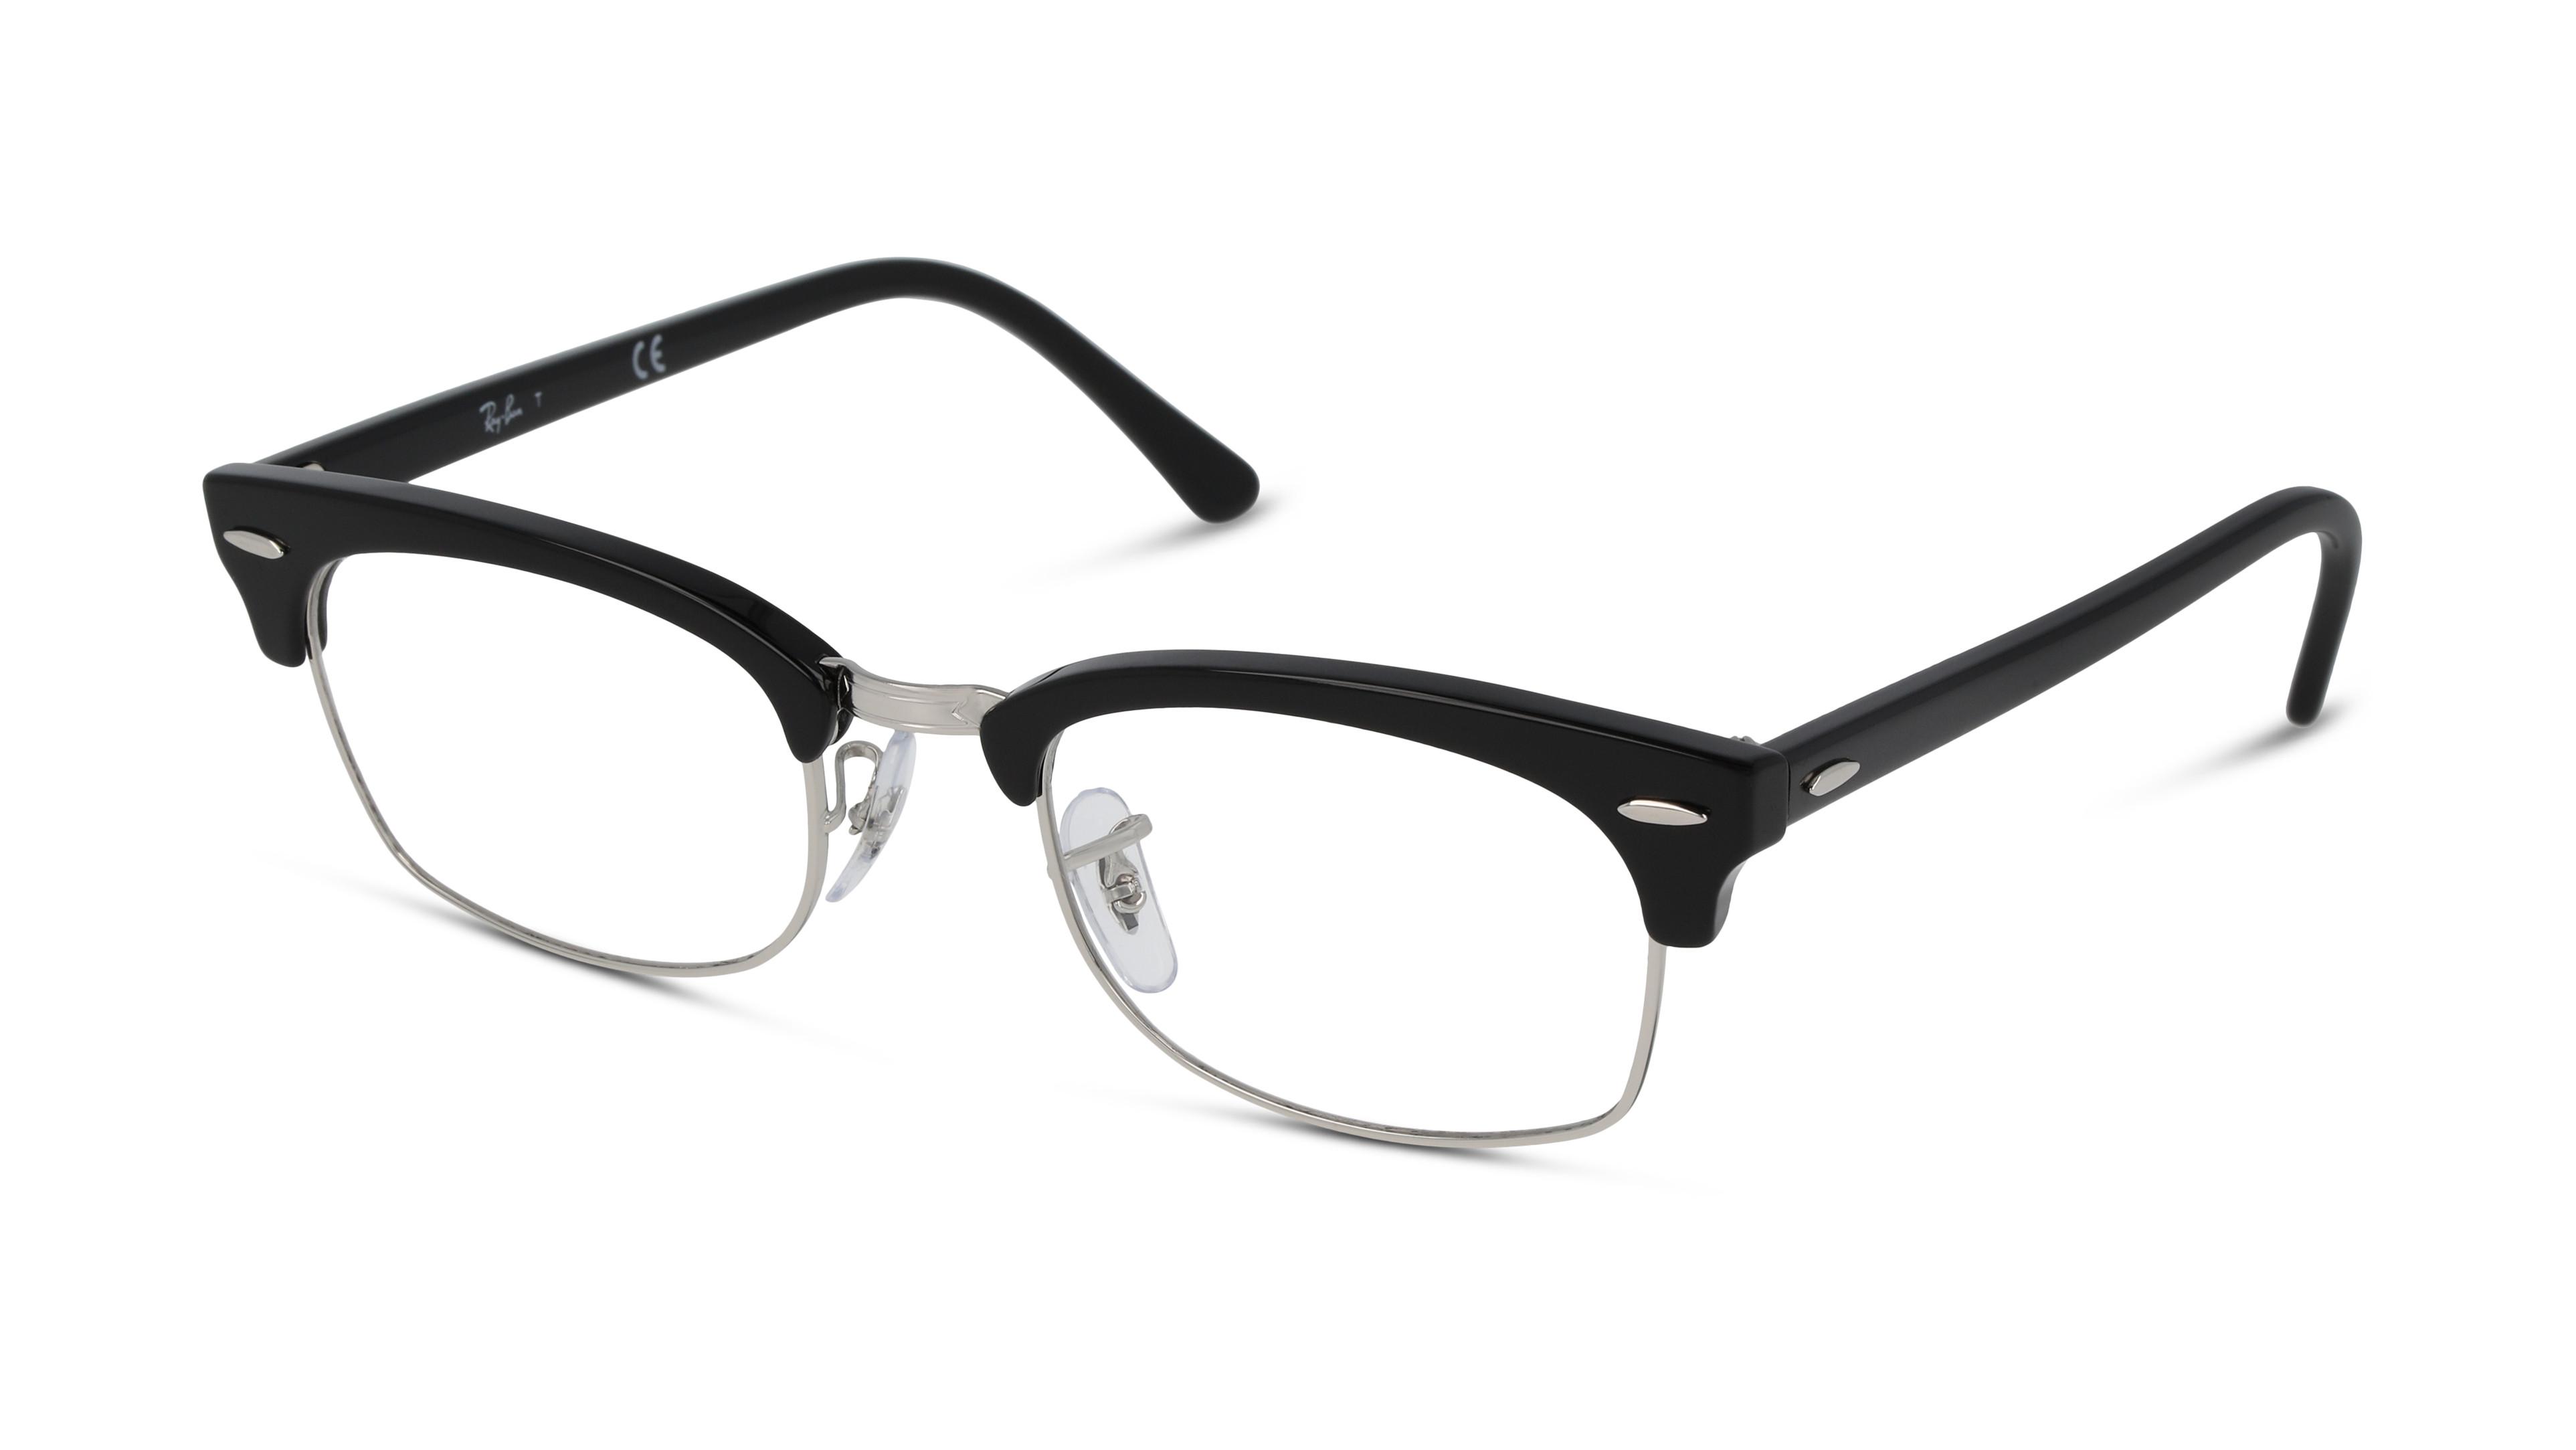 8056597245715-angle-ray-ban-brillenfassung-0rx3916v-eyewear-shiny-black